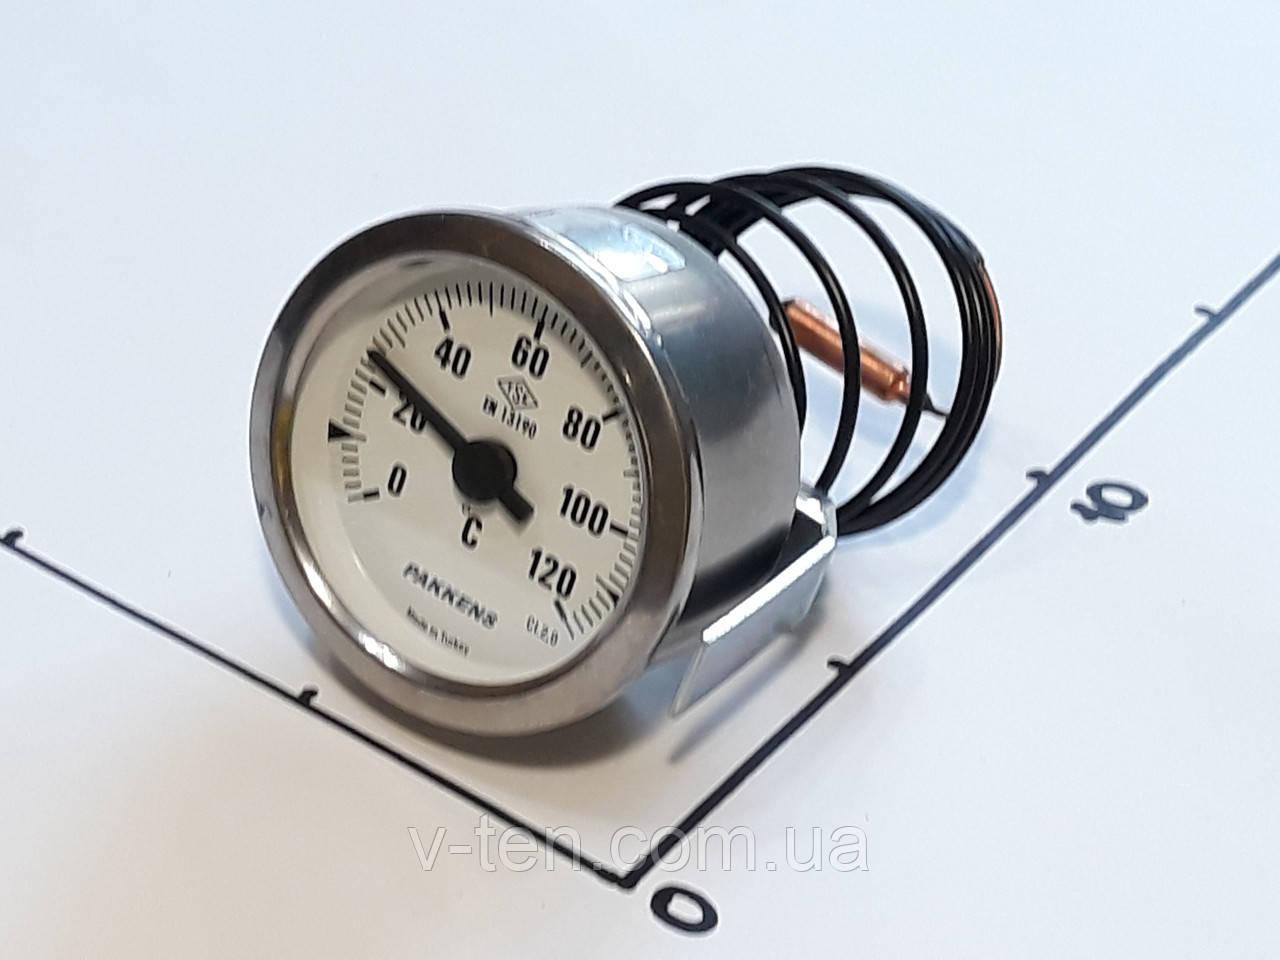 Термометр Ø60мм / 120°С / L-100 cм капиллярный PAKKENS (Турция)